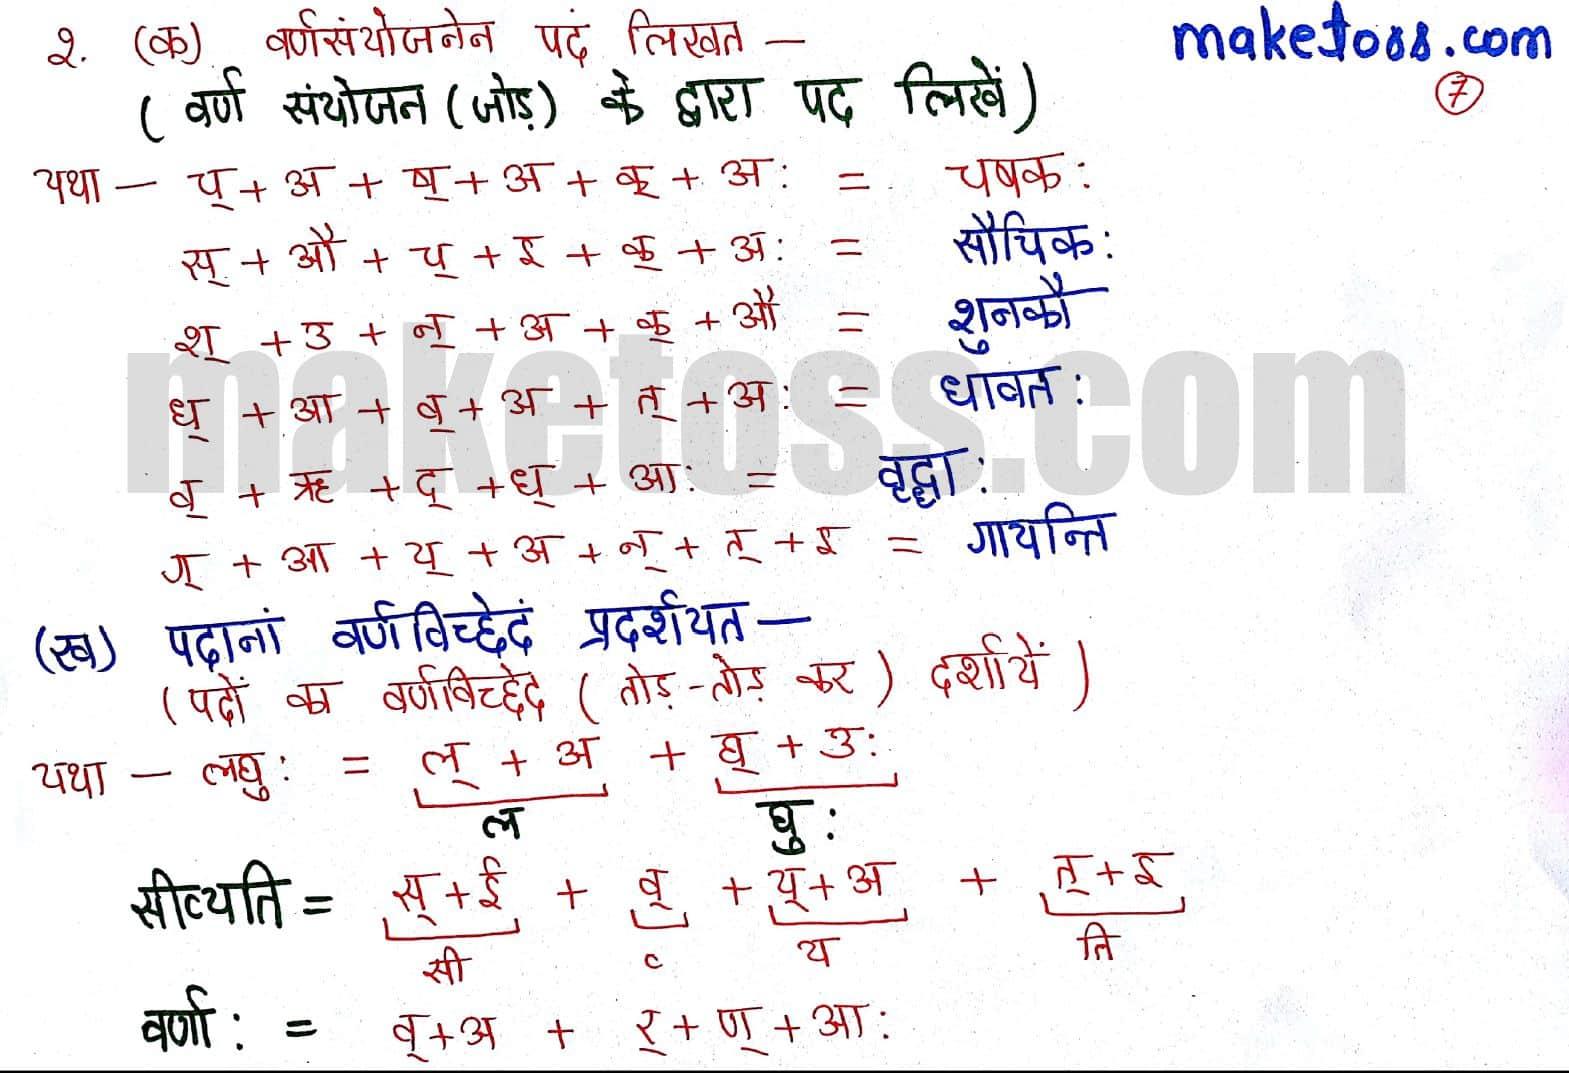 Sanskrit Class 6 chapter 1 - शब्दपरिचय 1 - translation in Hindi